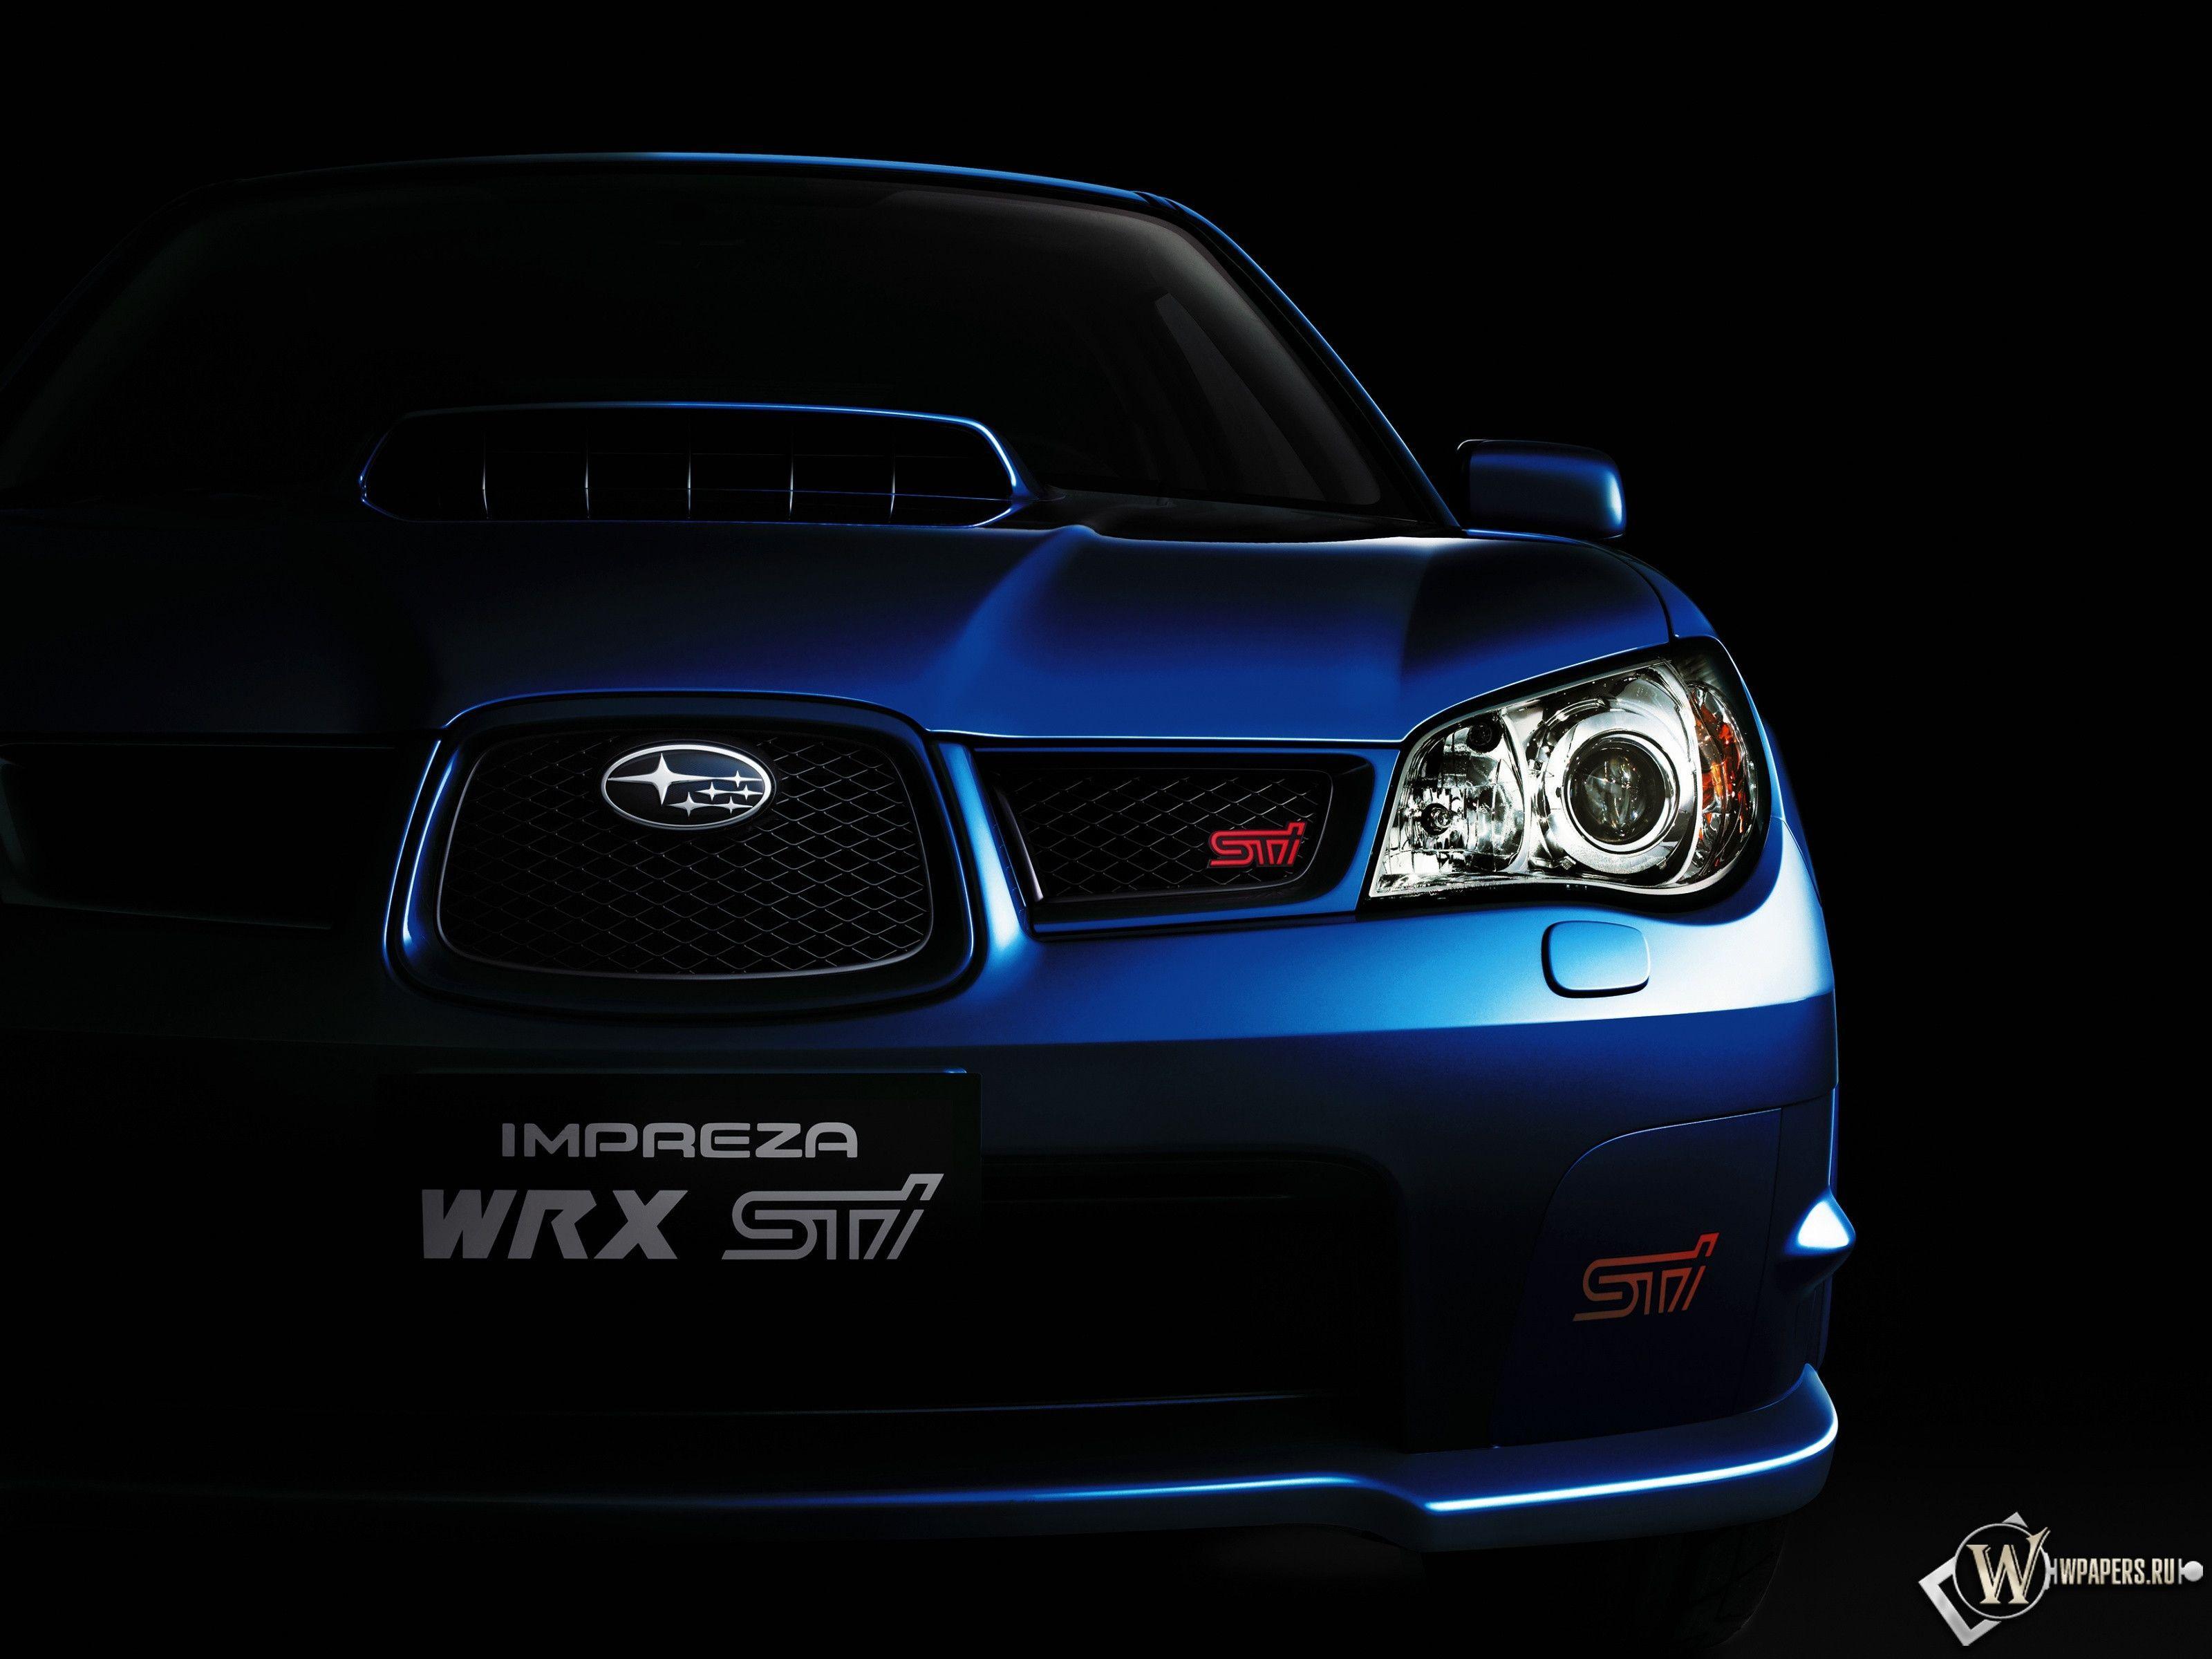 Subaru Impreza Wallpapers Top Free Subaru Impreza